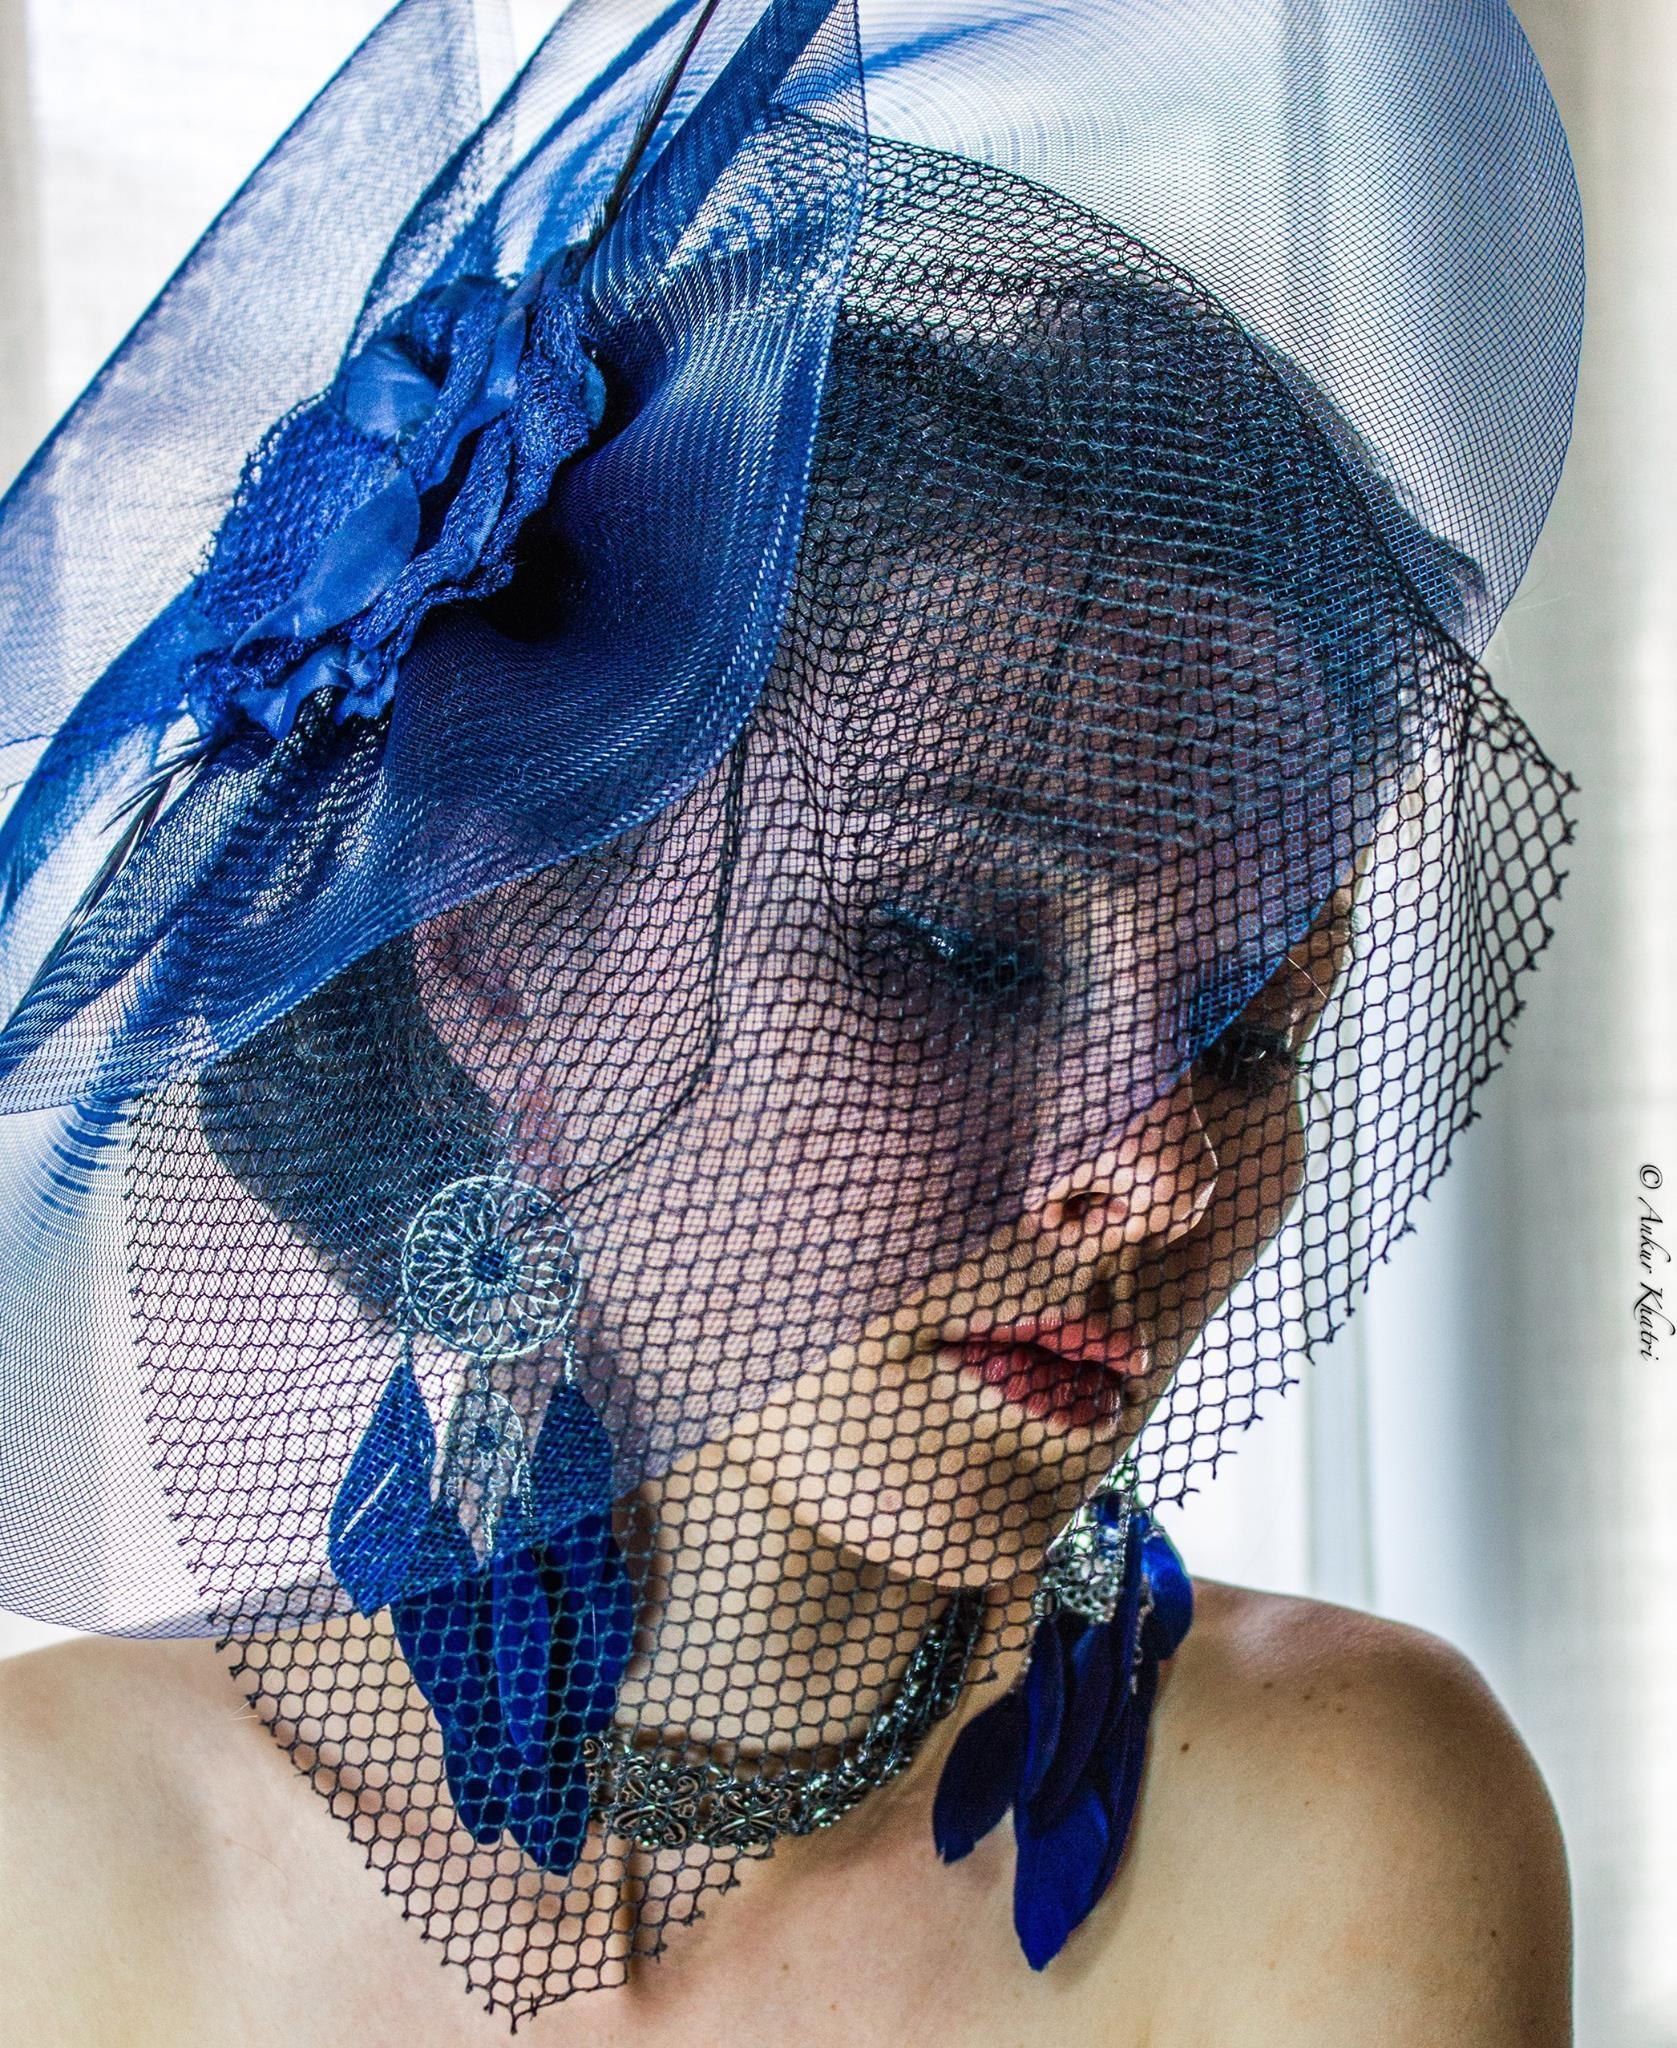 Some Elegance by Ankur Khatri